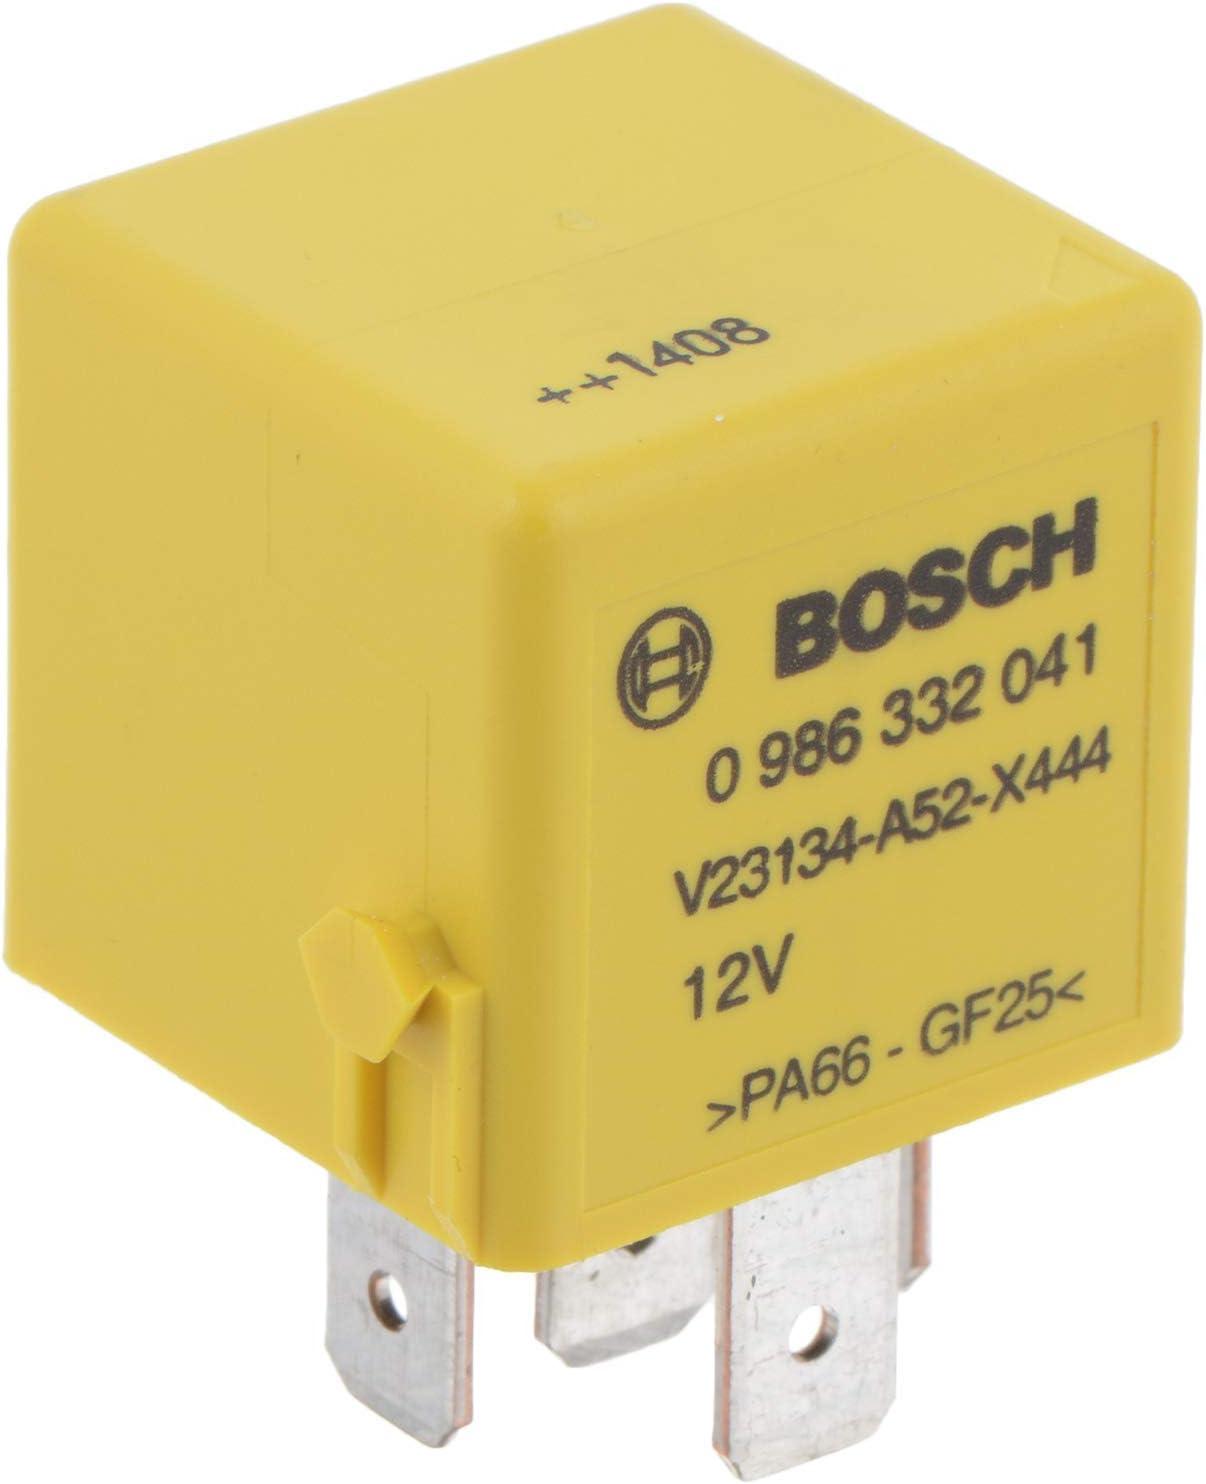 Bosch 0986332041 Mini Relais 12v 40a Ip5k4 Betriebstemperatur Von 40 C Bis 85 C Wechselrelais 5 Pin Relais Auto